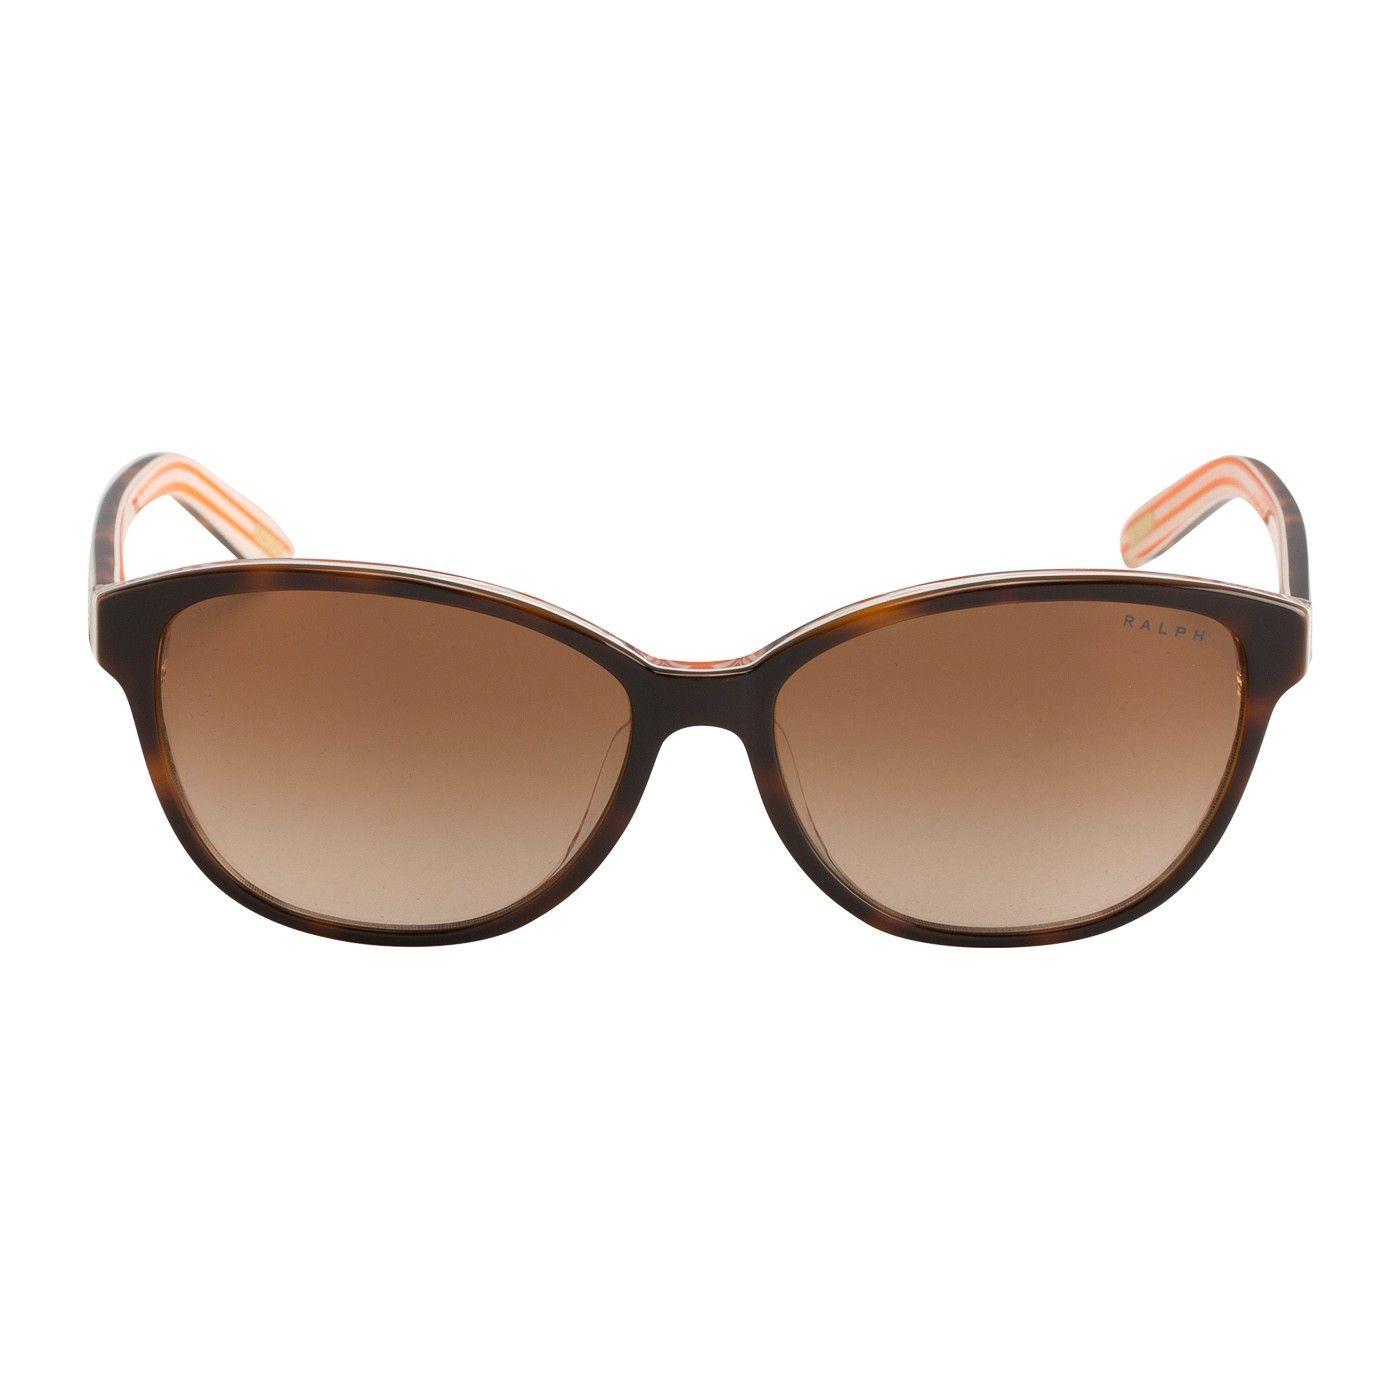 b009541bc03 RALPH by Ralph Lauren zonnebril Amber Orange Stripes RA5128 977 13